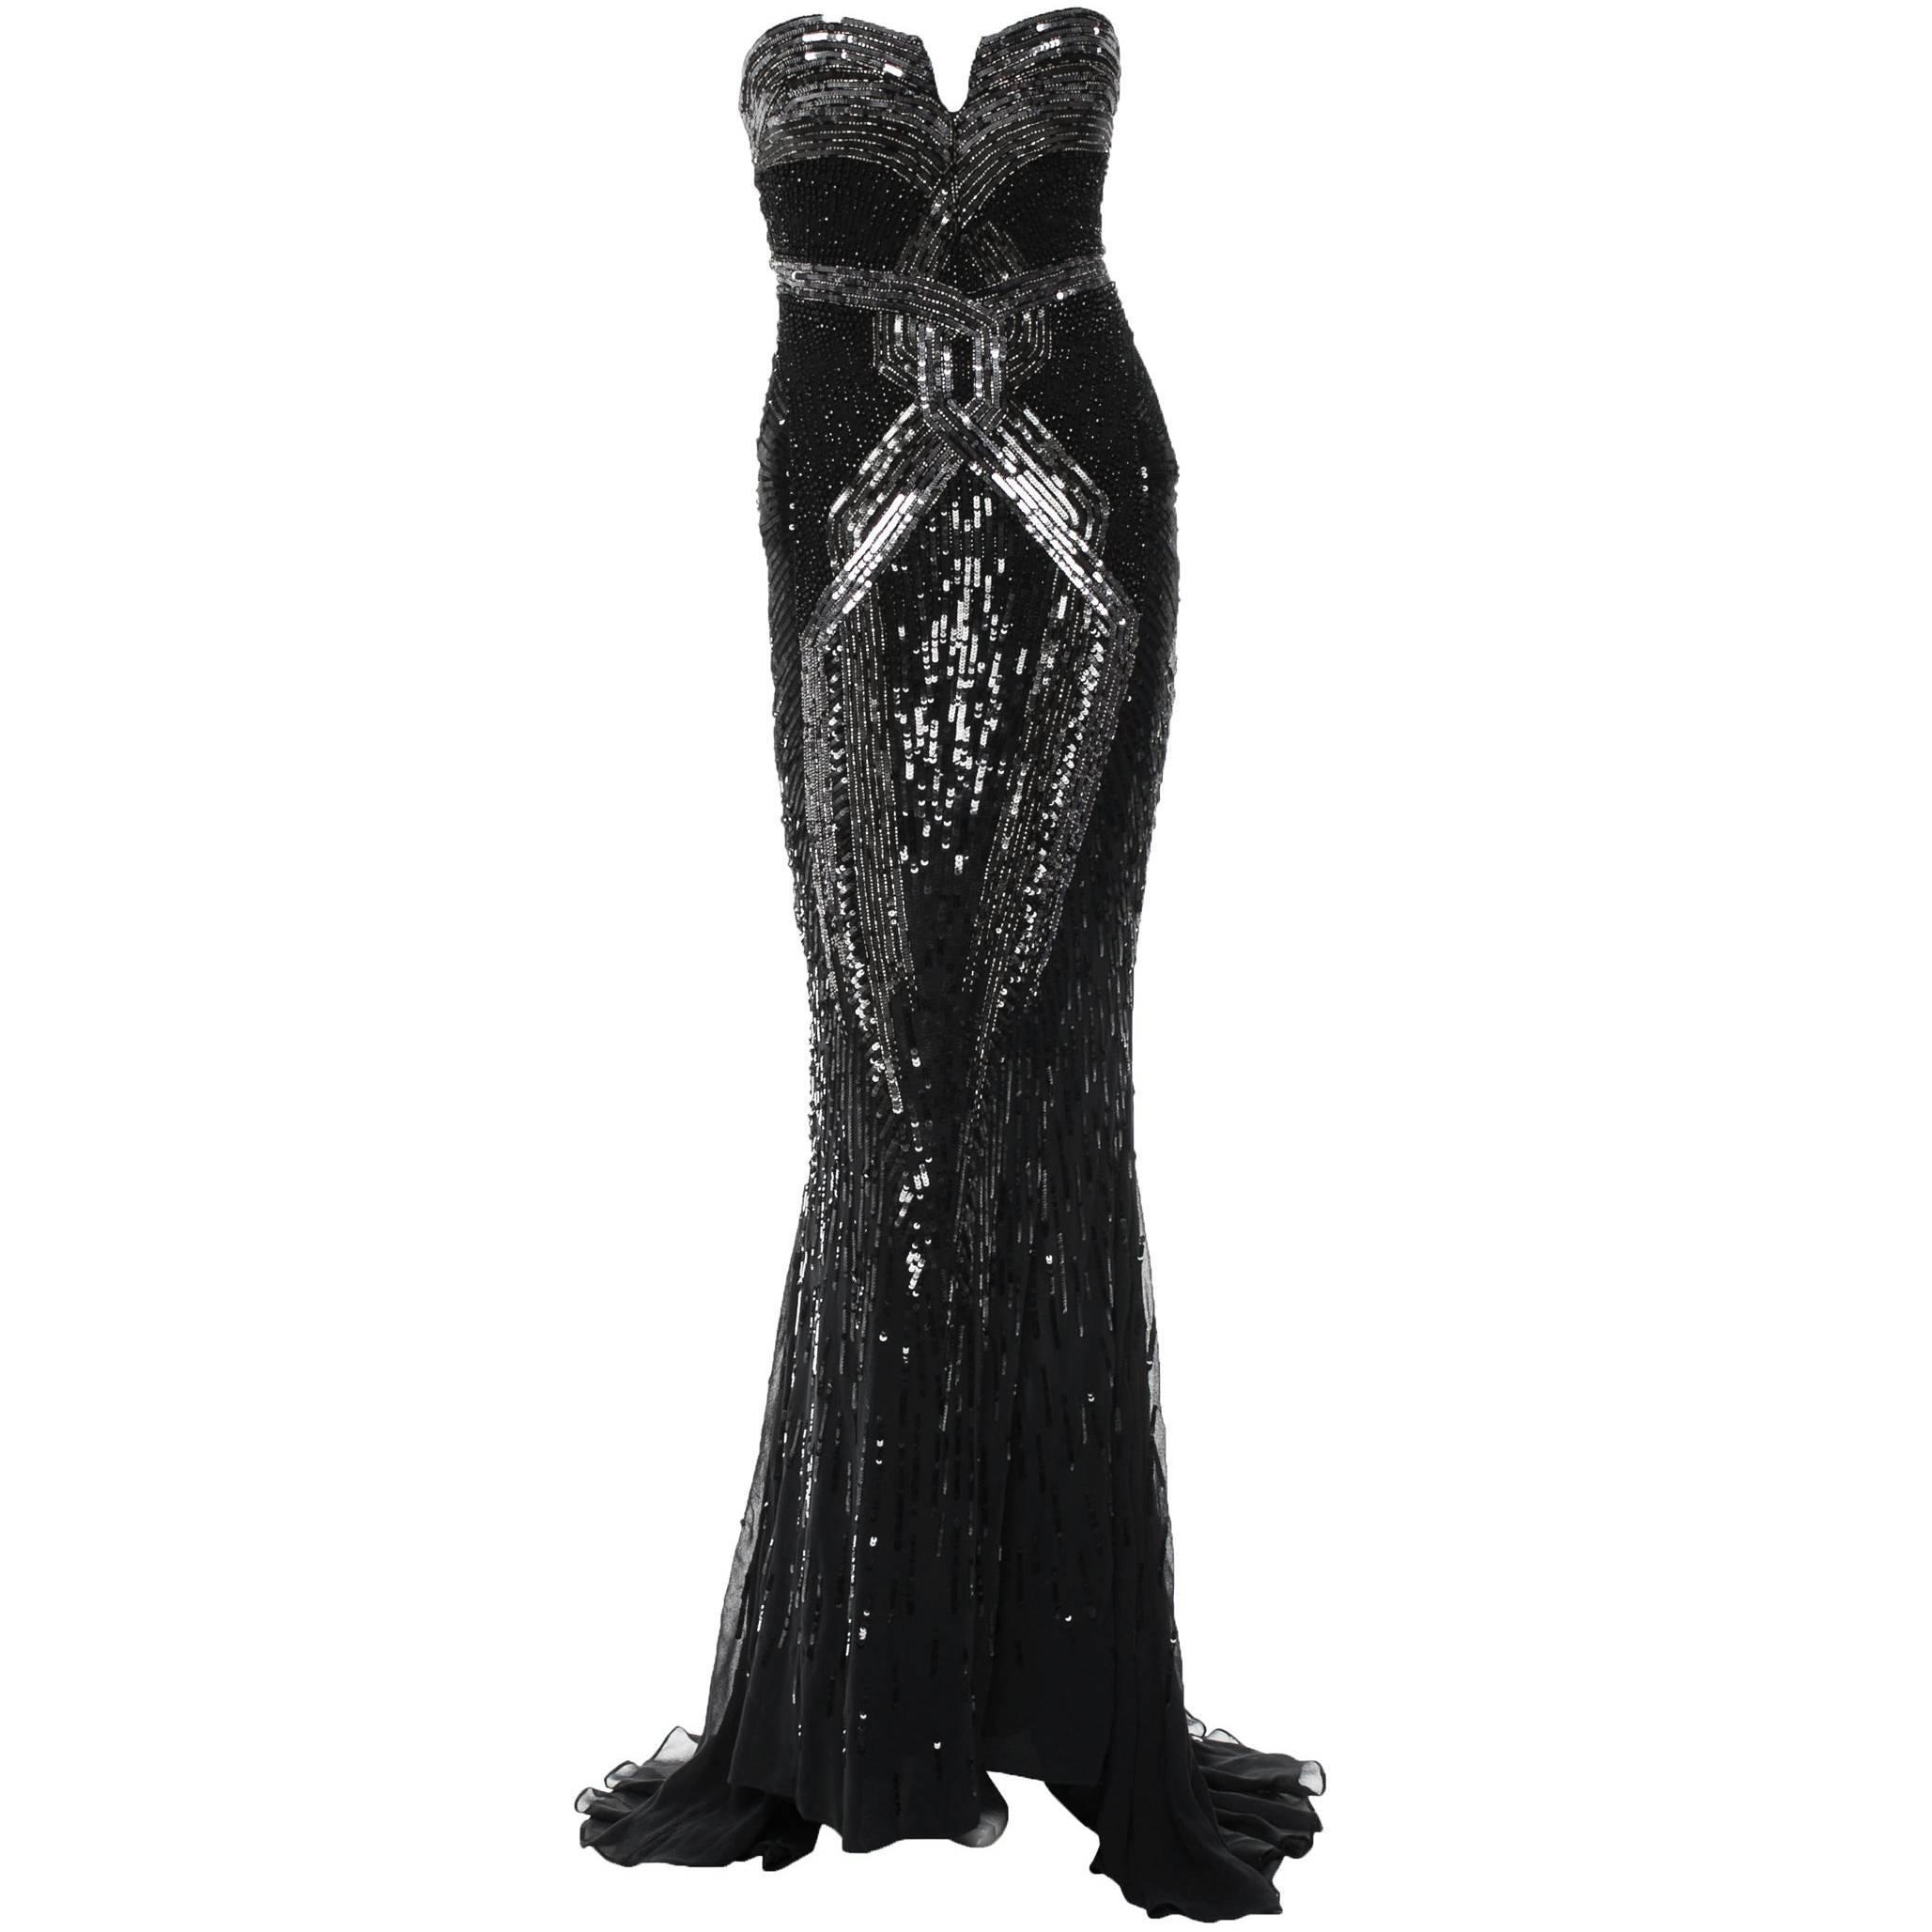 New Roberto Cavalli Fully Beaded Silk Corset Black Dress Gown It.40 - US 4